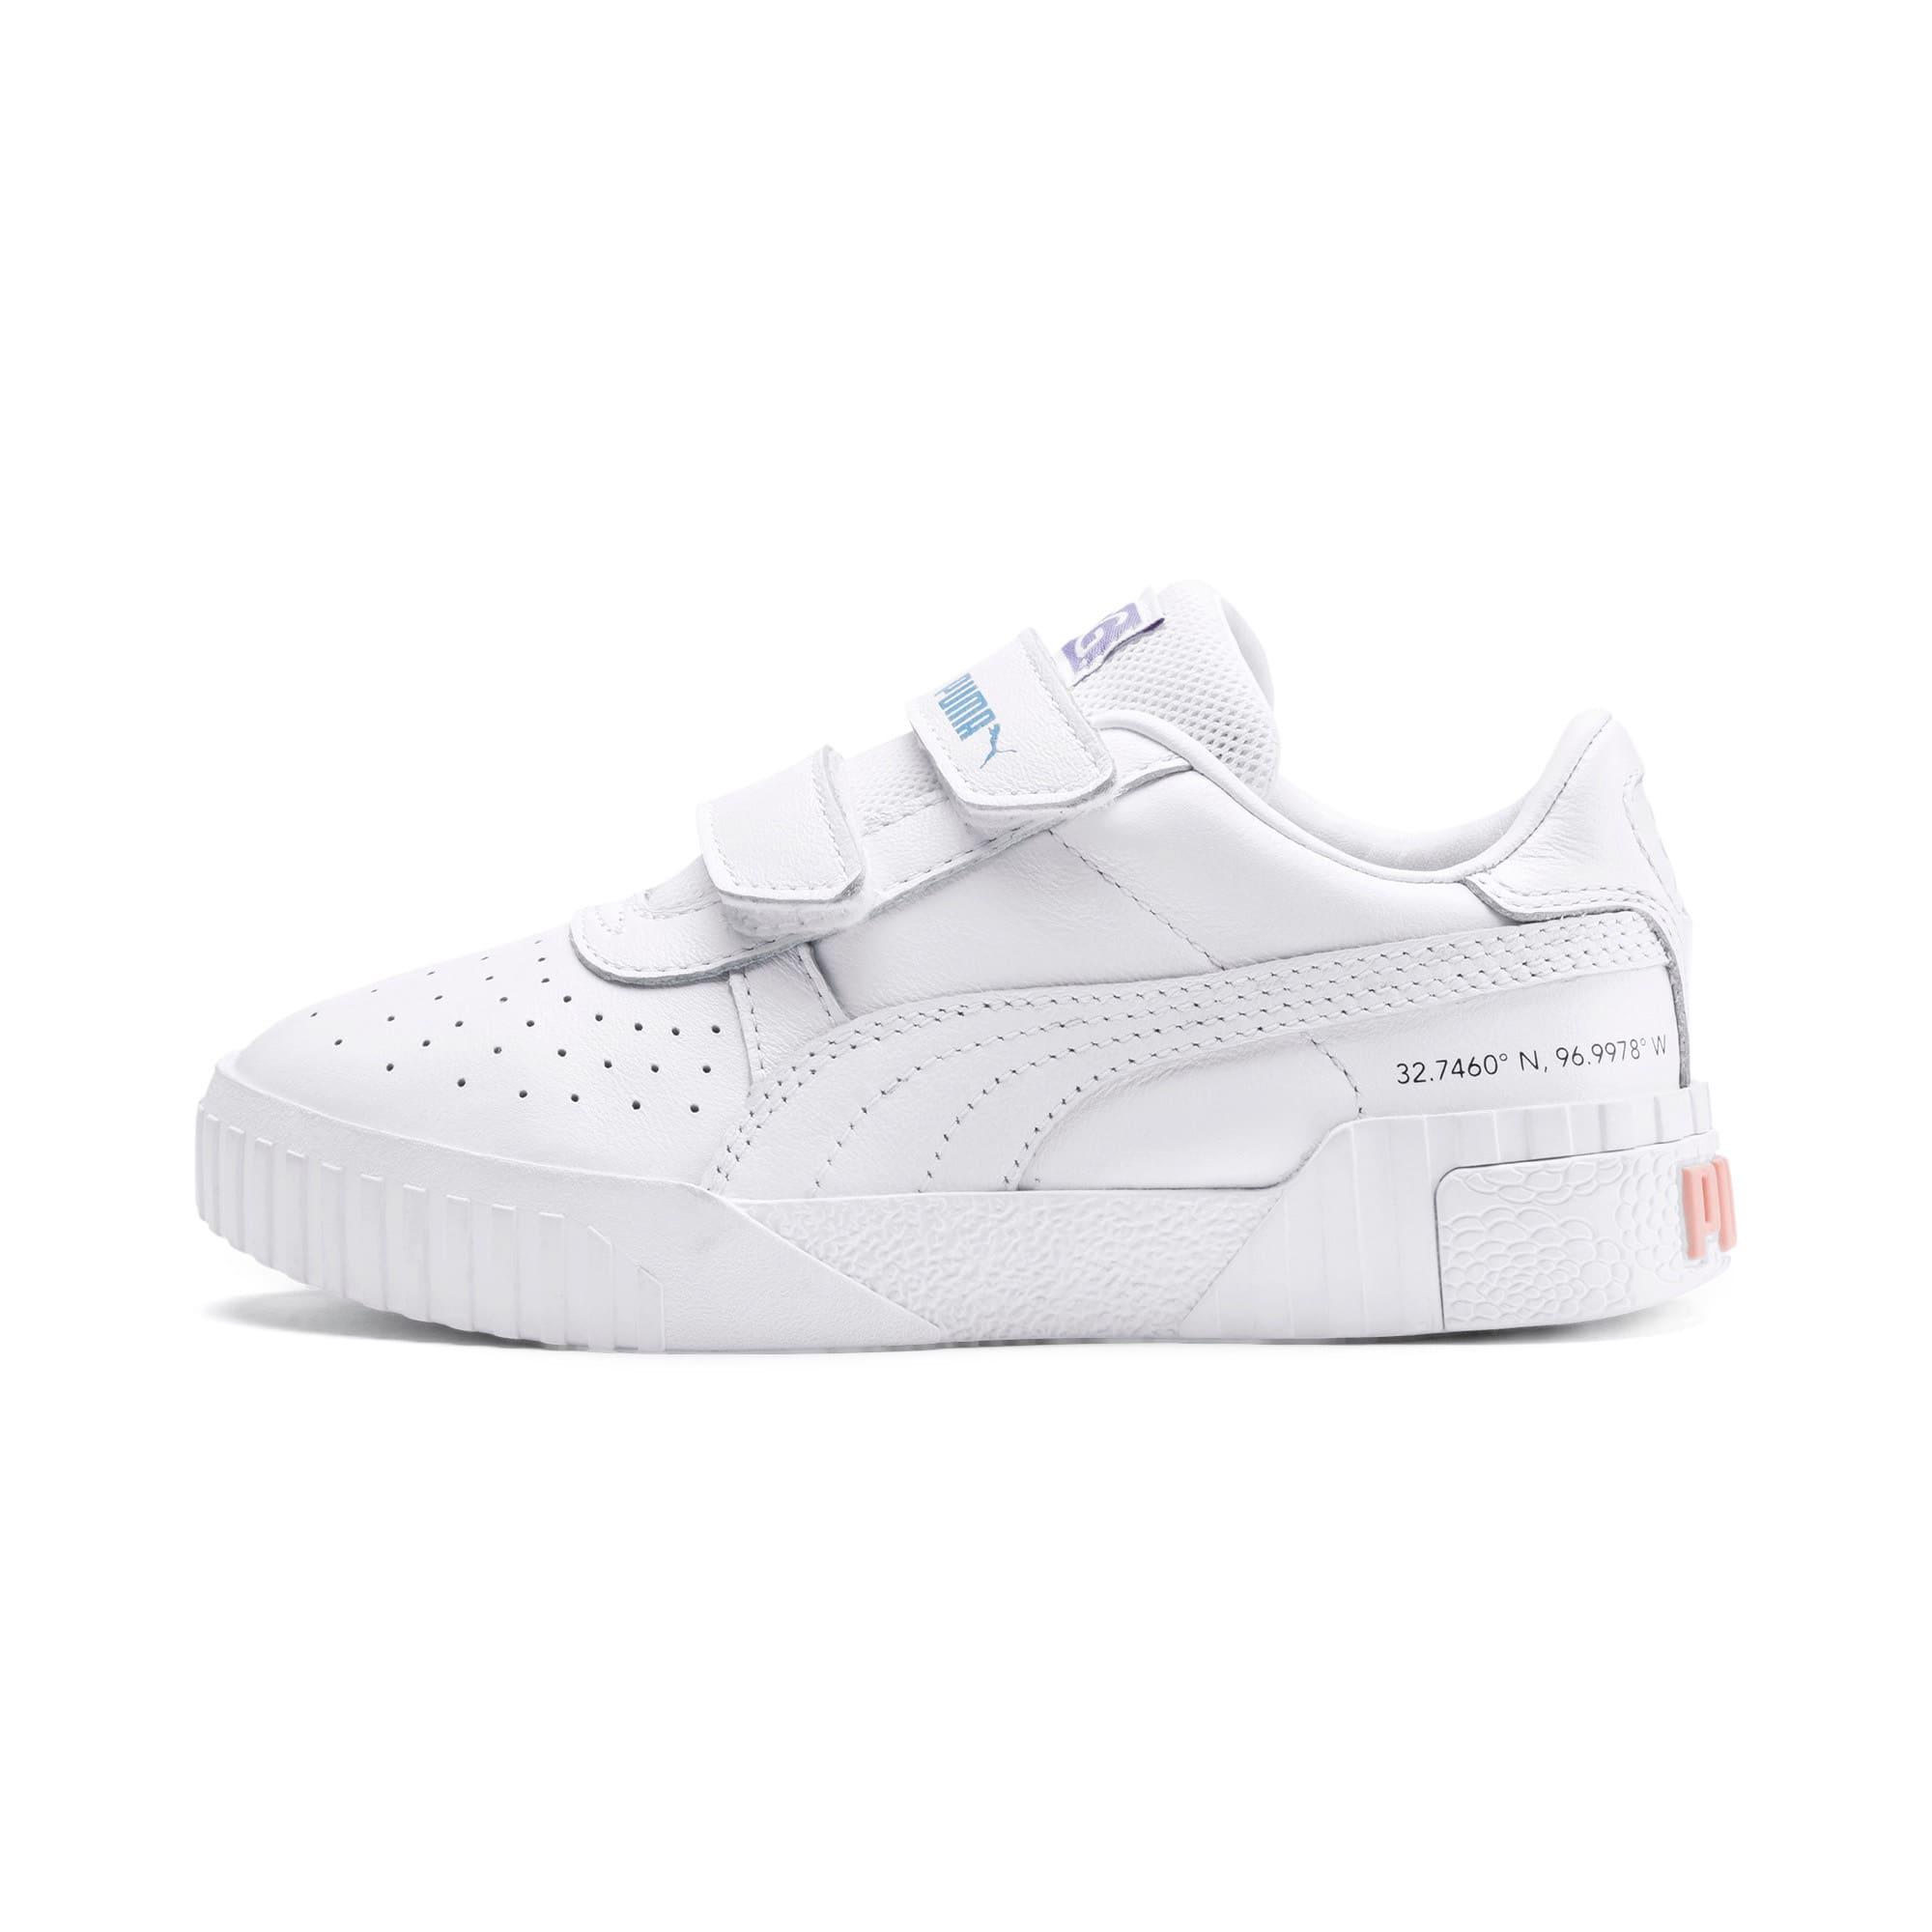 Imagen en miniatura 1 de Zapatillas de niño Cali PUMA x SELENA GOMEZ, Puma White-Puma White, mediana